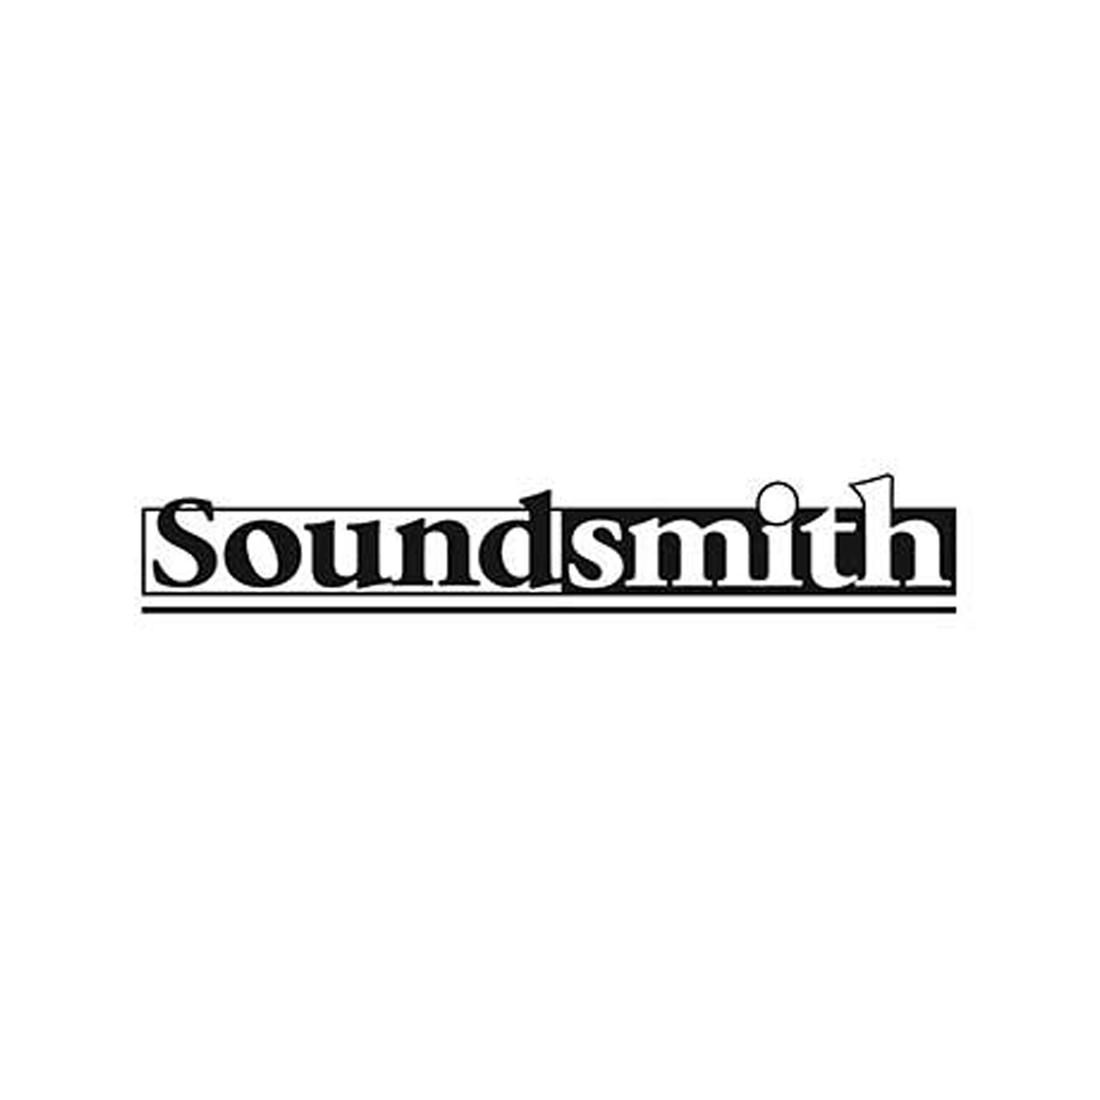 Soundsmith